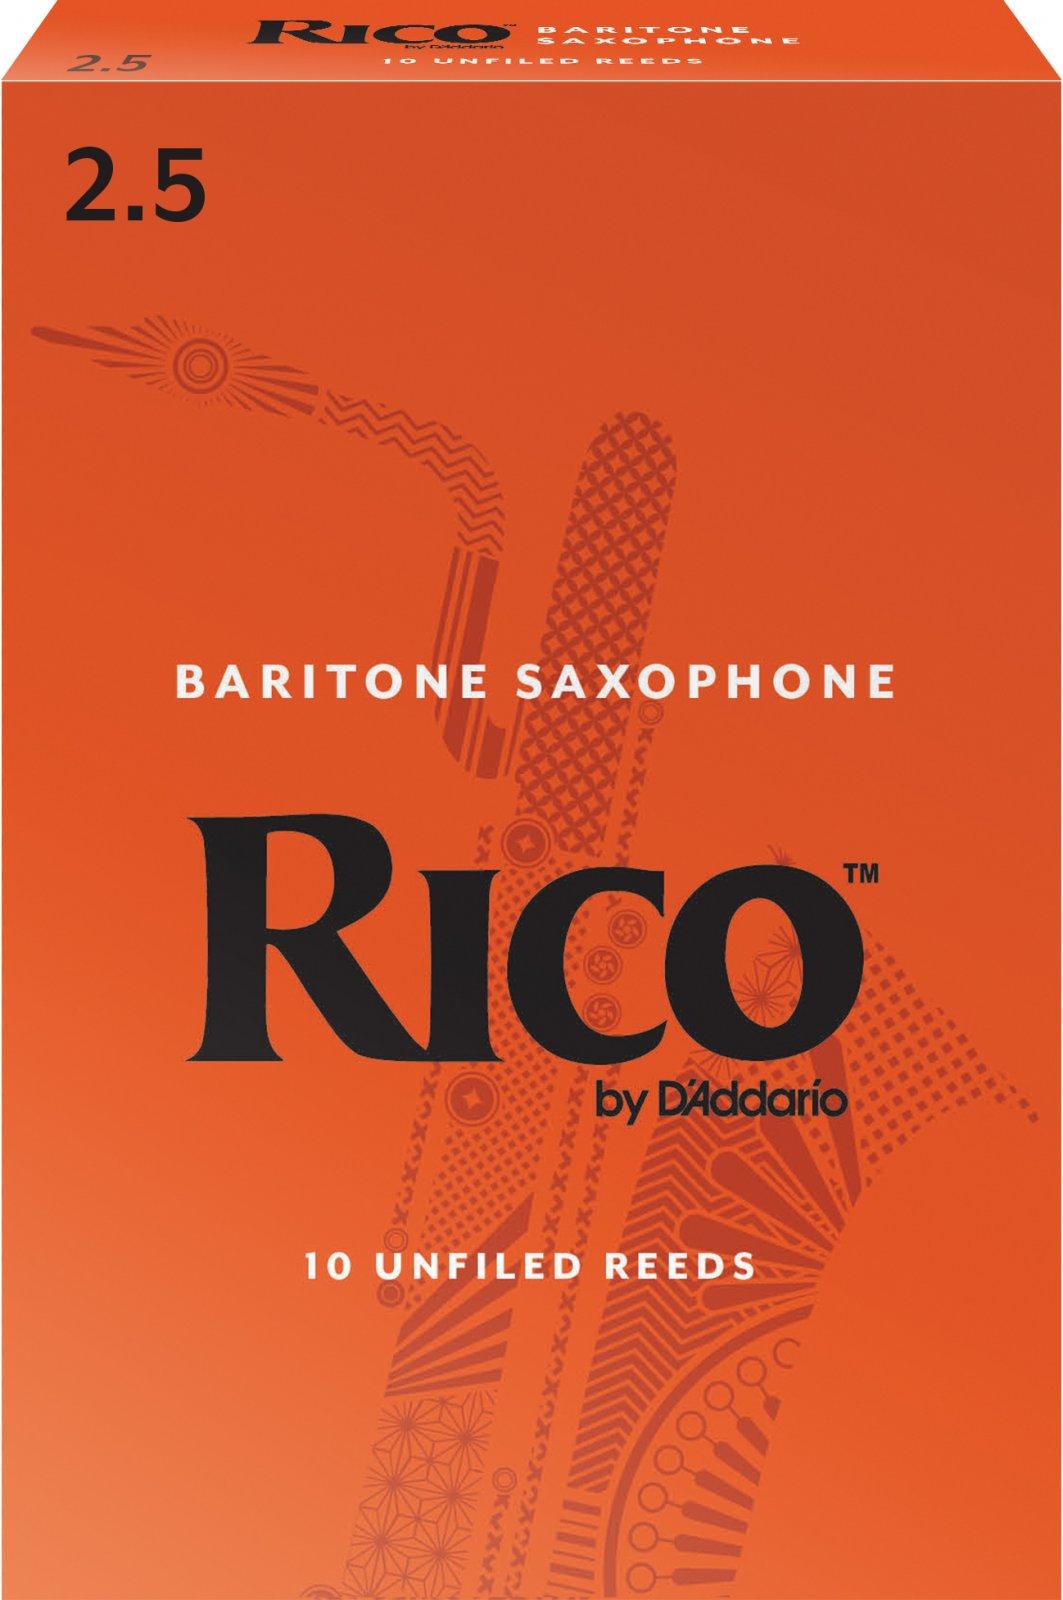 Rico by D'Addario Baritone Saxophone Reeds, 10-Pack